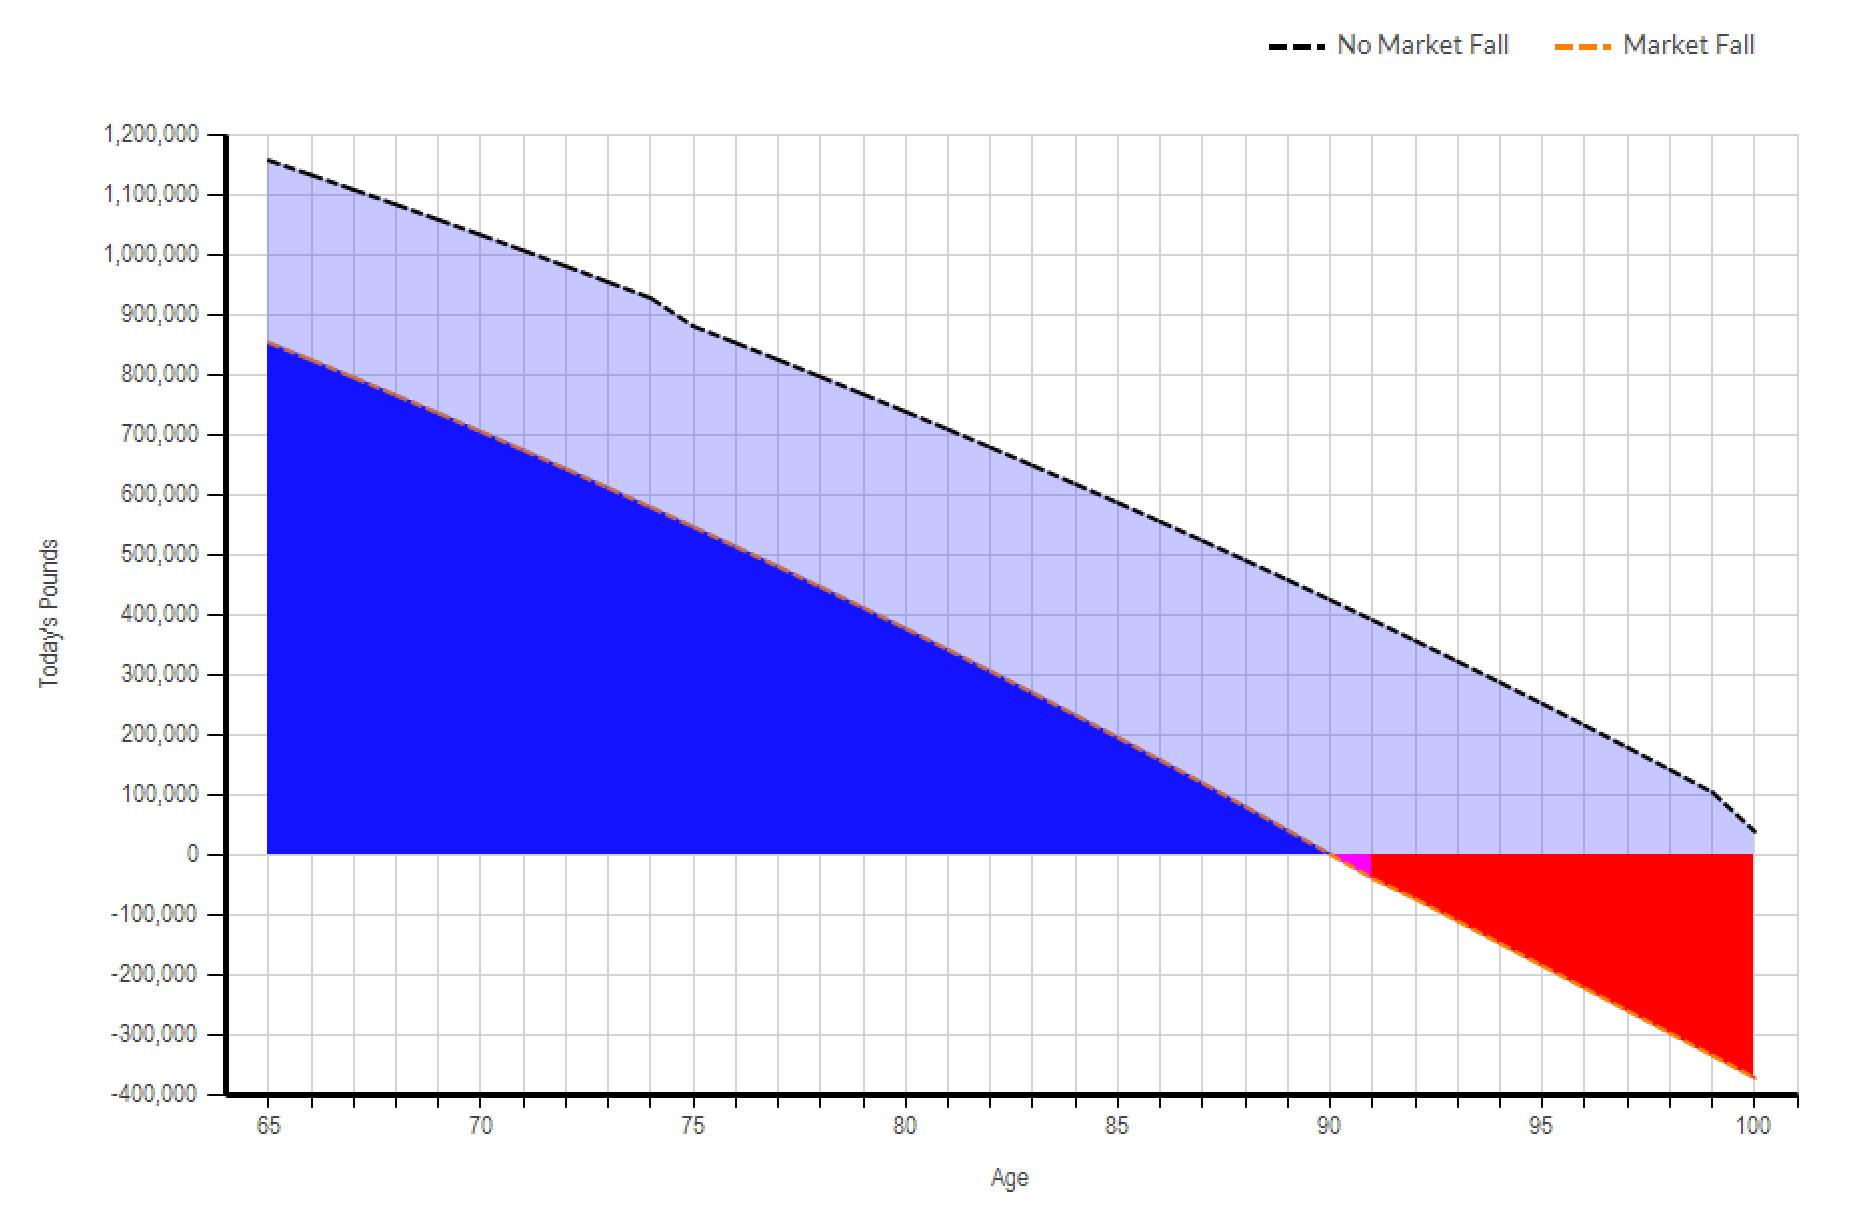 truth software cashflow modelling assumptions capacity for loss market crash flexi access drawdown scenario